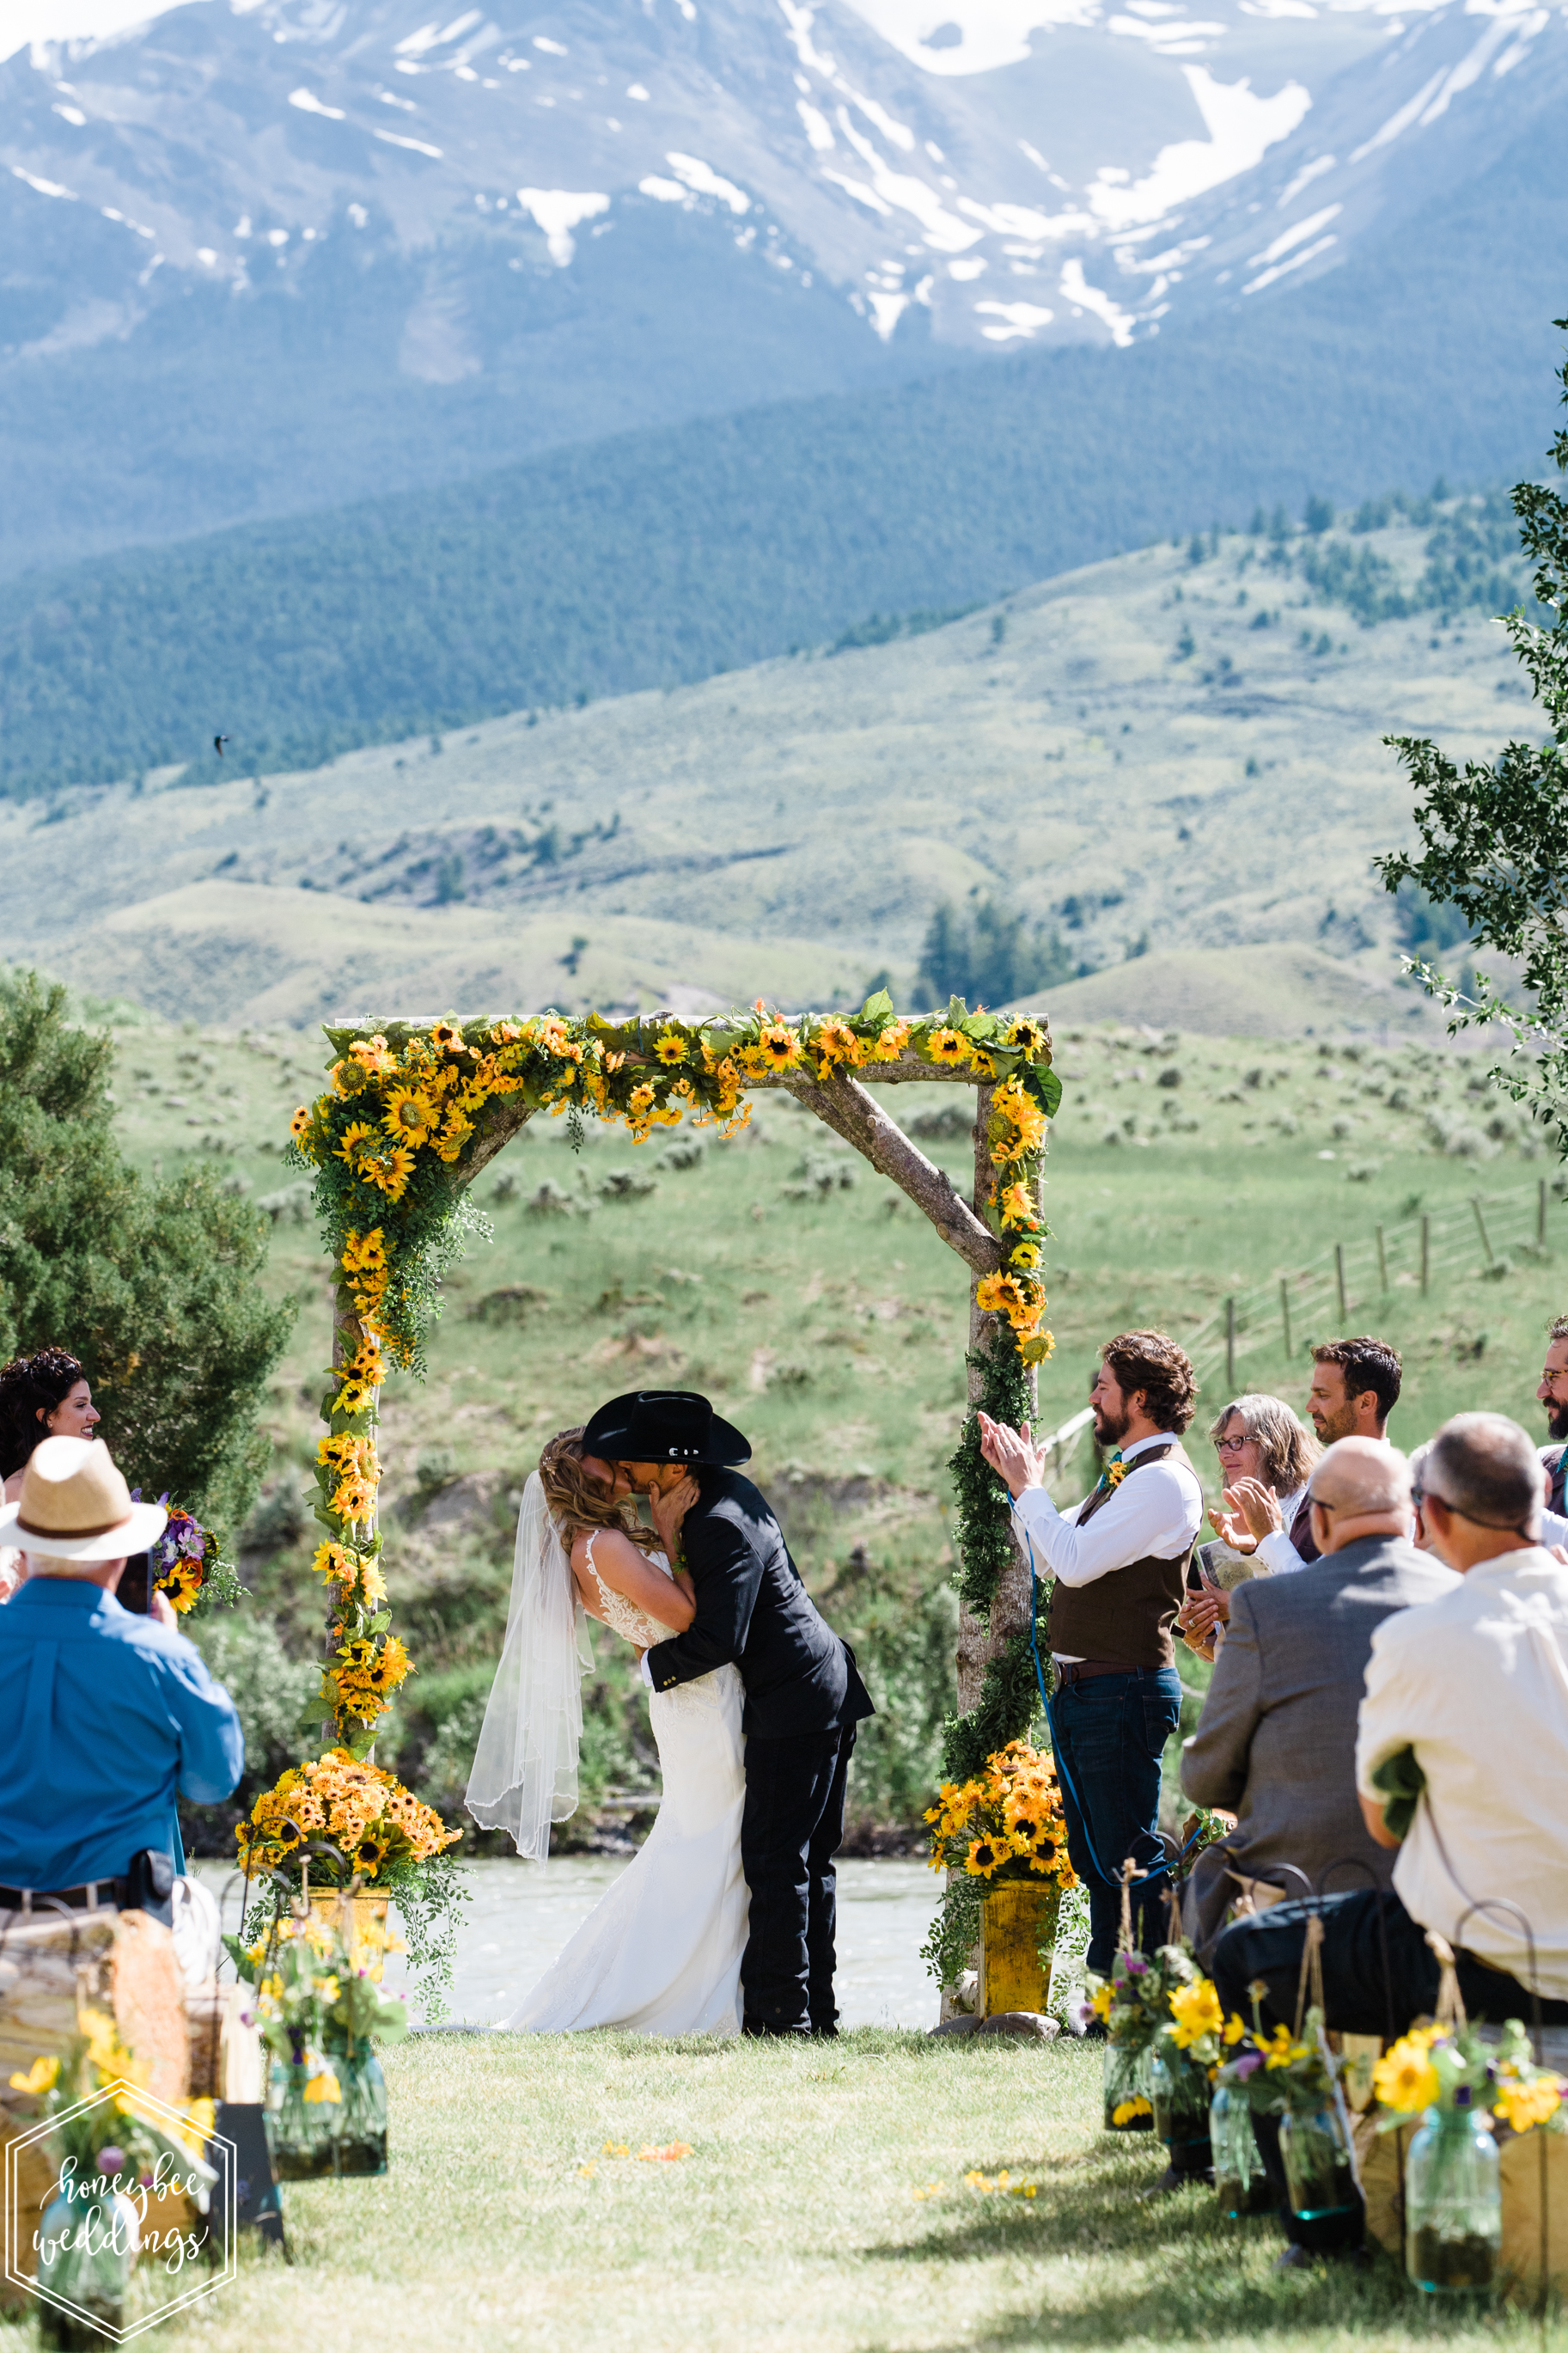 063Yellowstone National Park Wedding_Montana Wedding Photographer_Honeybee Weddings_Shannon & Jonathan_June 29, 2019-1603.jpg